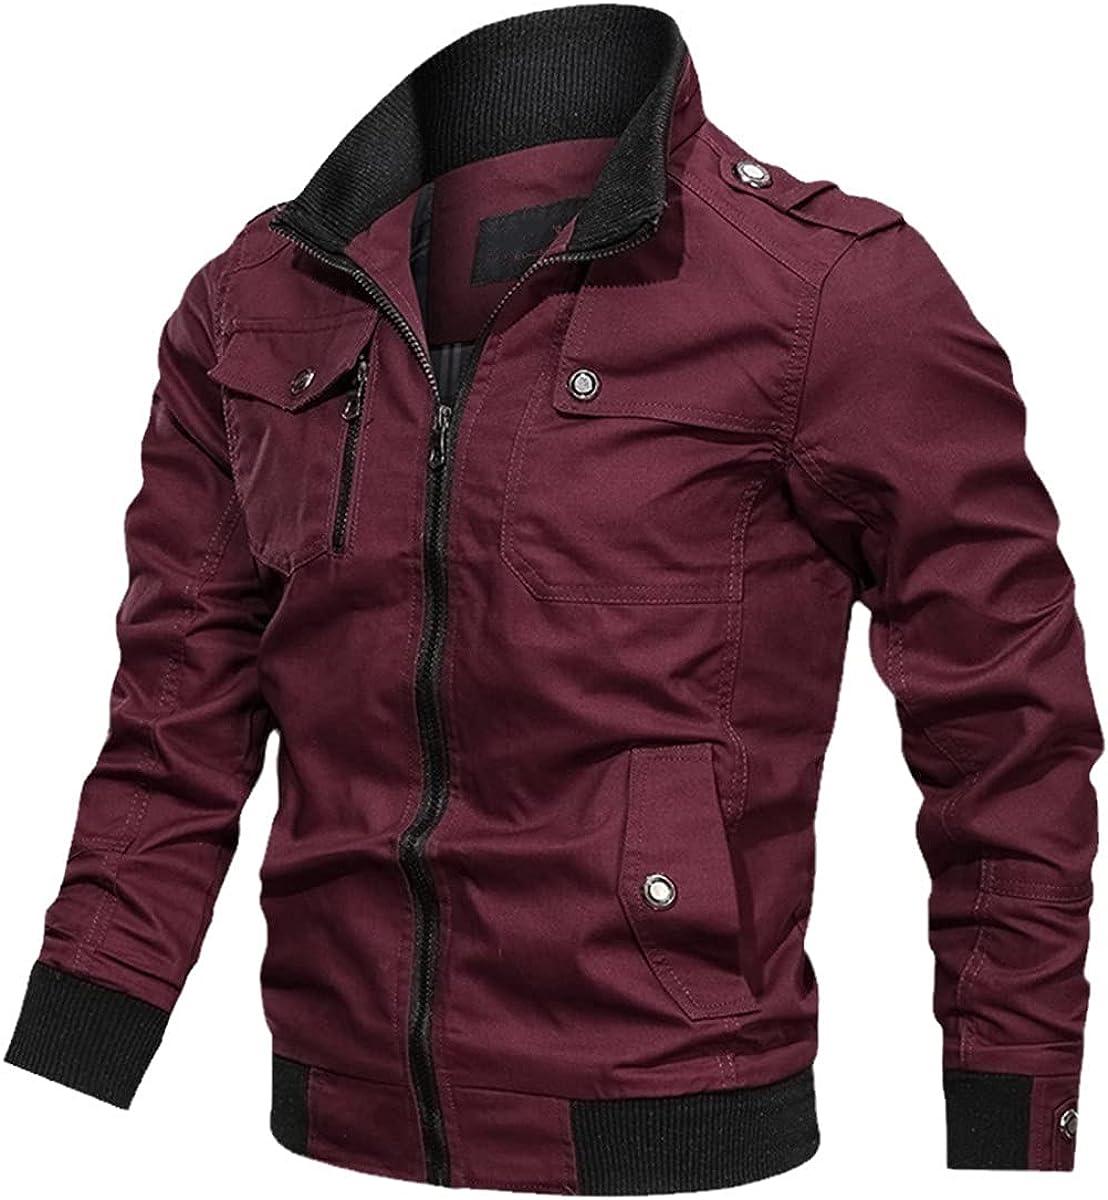 Military Jacket Men's Spring And Autumn Cotton Windbreaker Men's Bomber Jacket Cargo Jacket